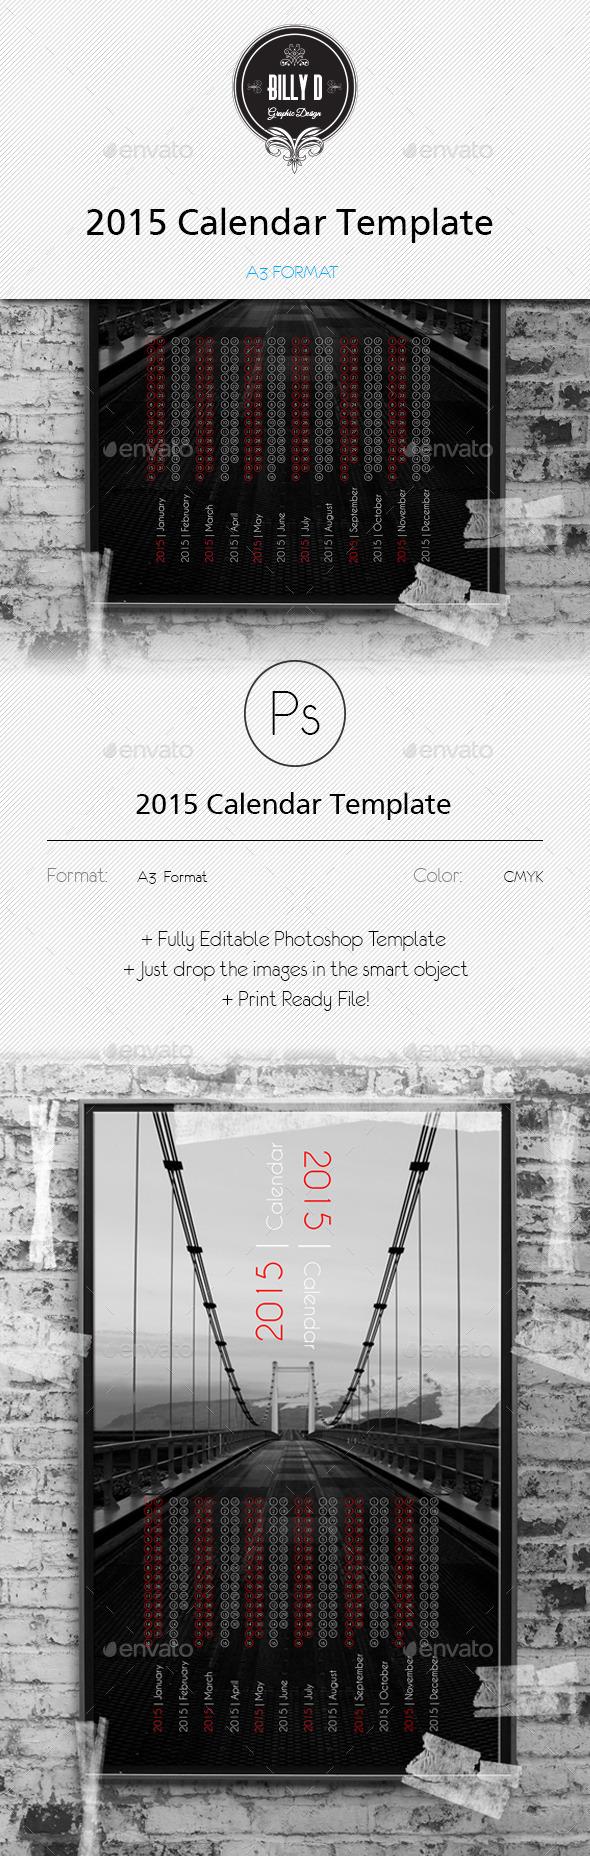 GraphicRiver 2015 Calendar Template A3 Format 9768364